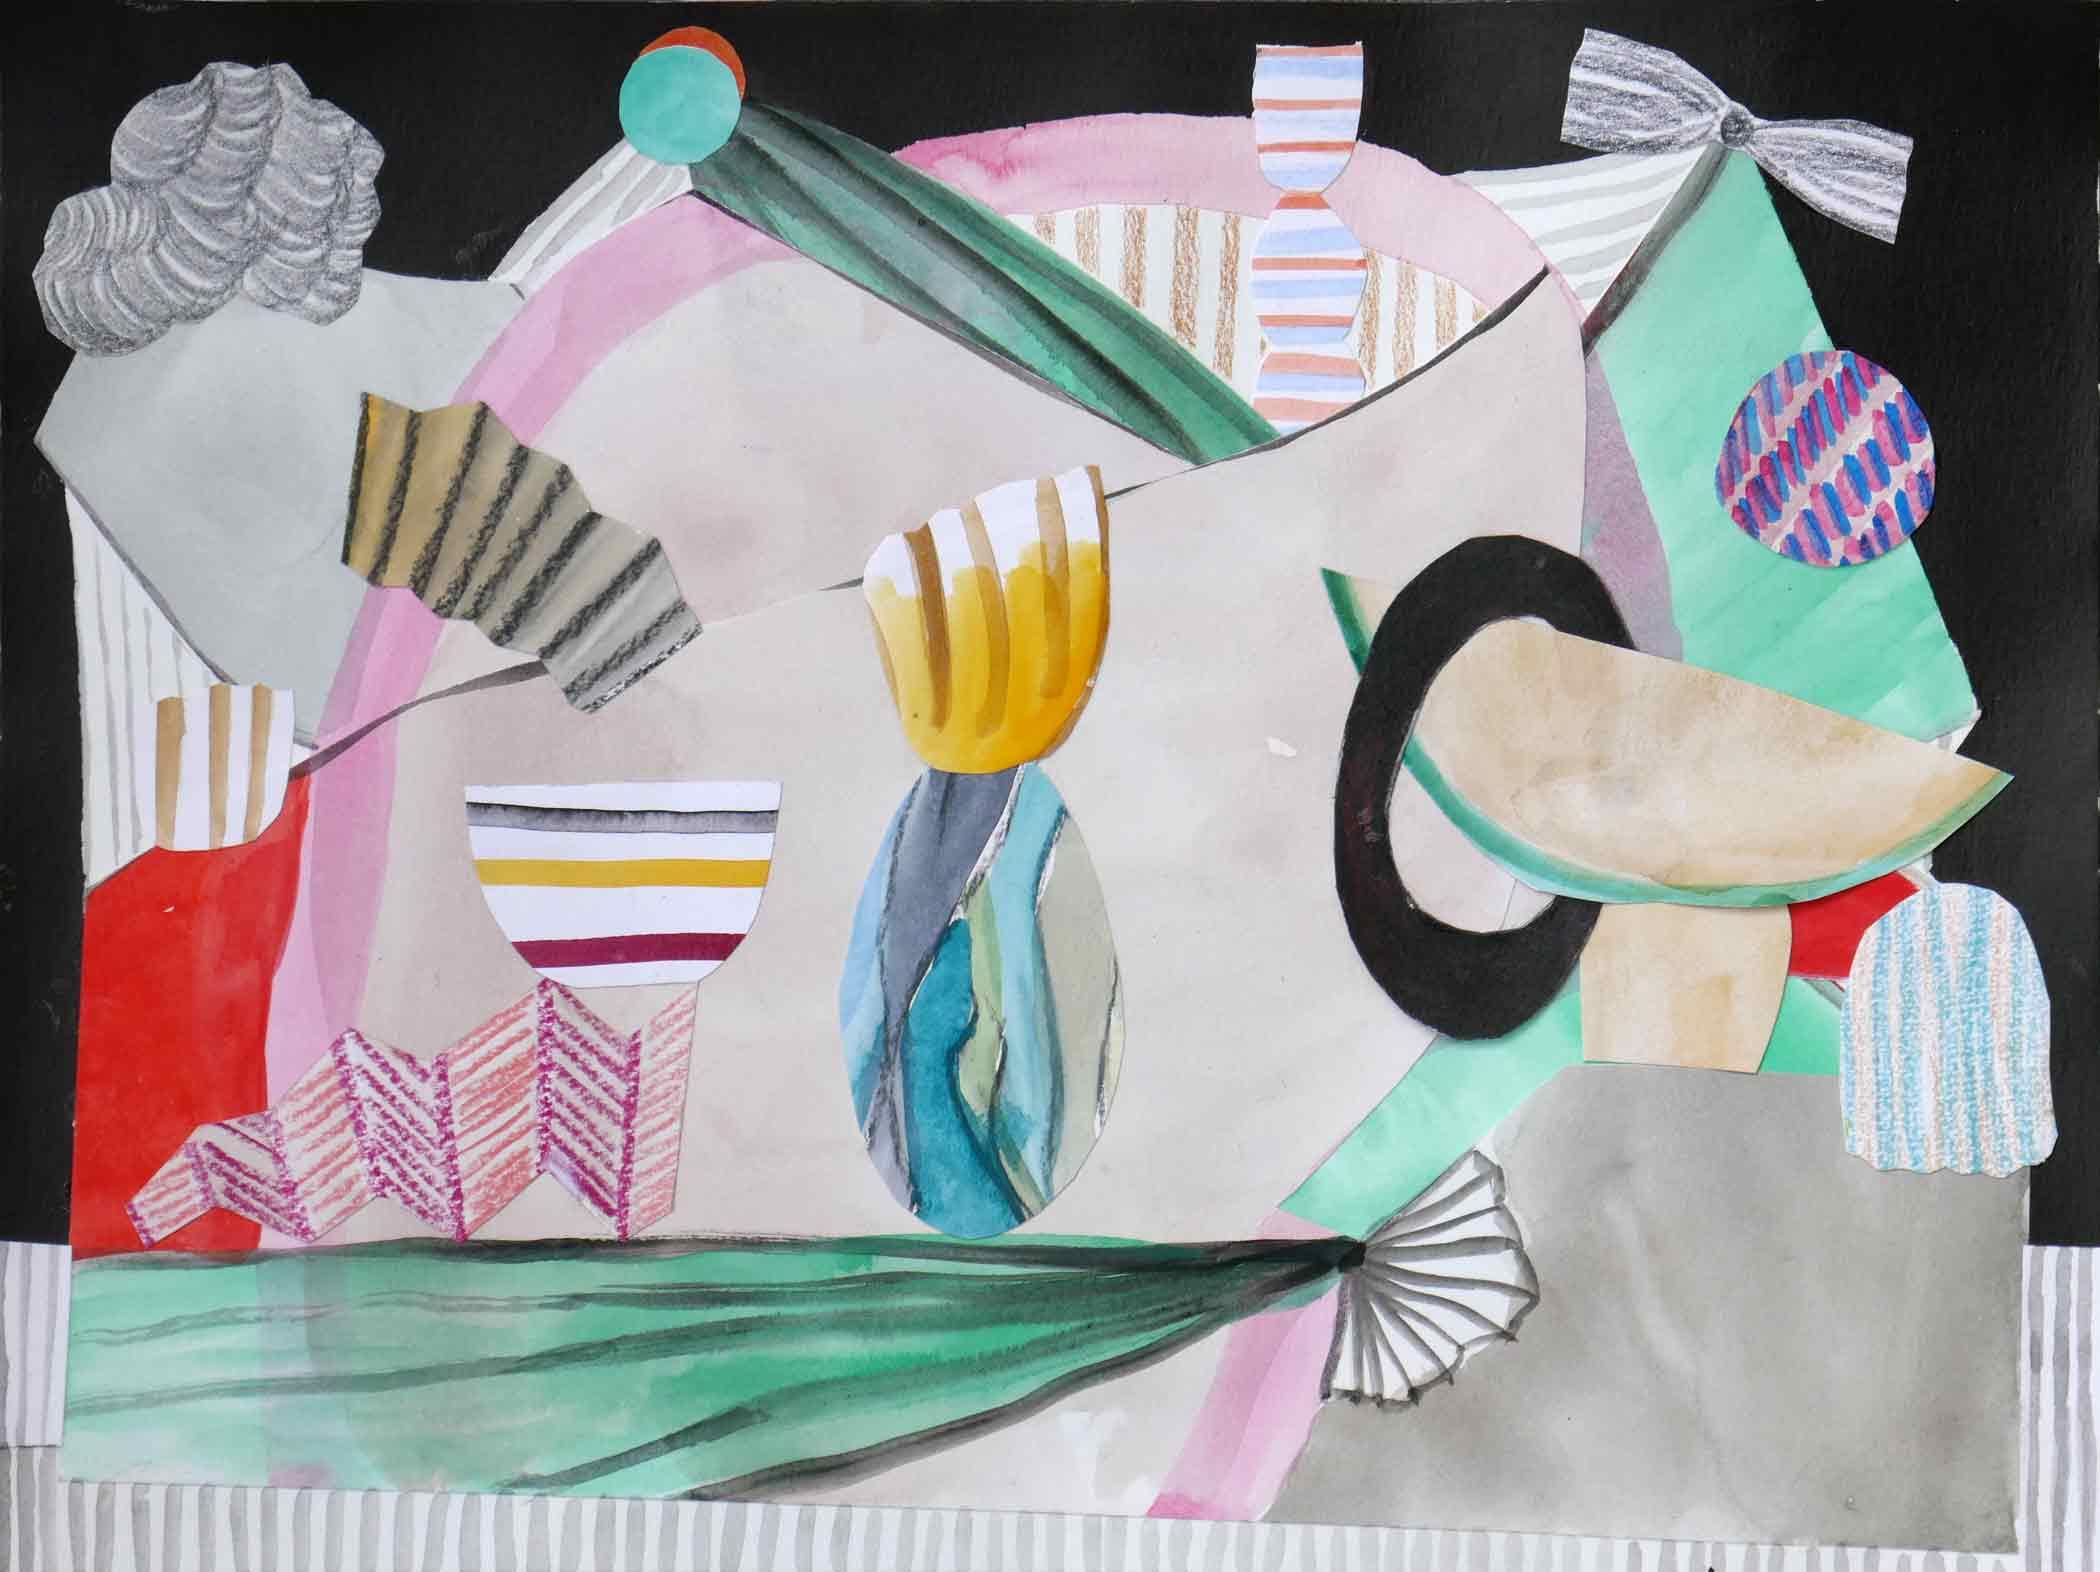 Uit de serie  Wellness  collage; inkt, potlood, aquarel, gouache 24 x 32 cm, 2018